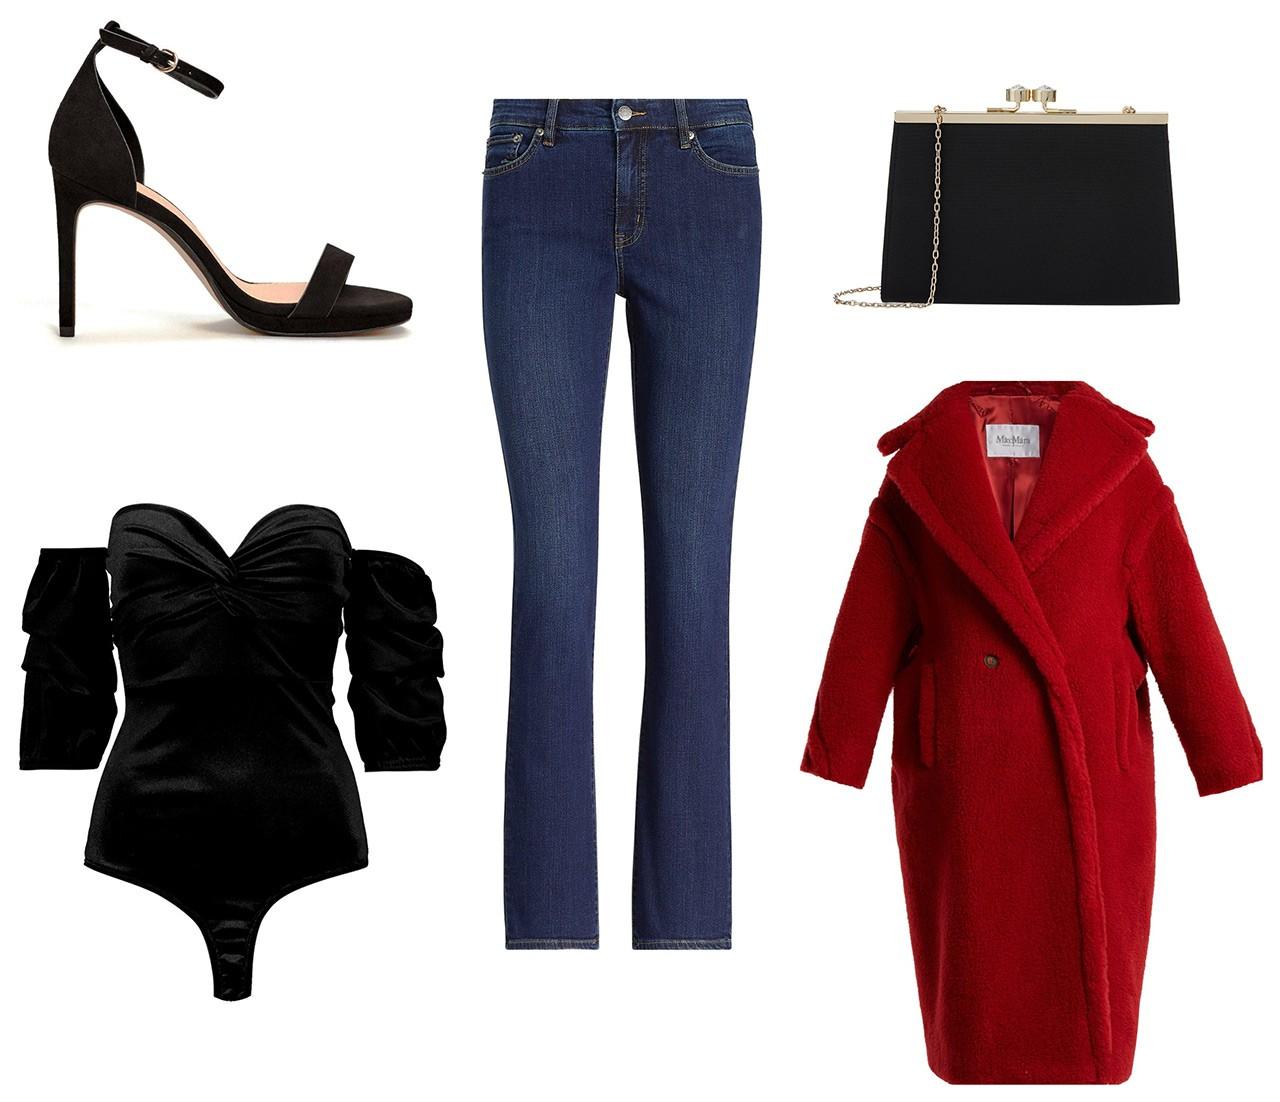 9e54a7962afd Casual chic  Τρεις τρόποι για να φορέσετε τα jeans στις γιορτές ...